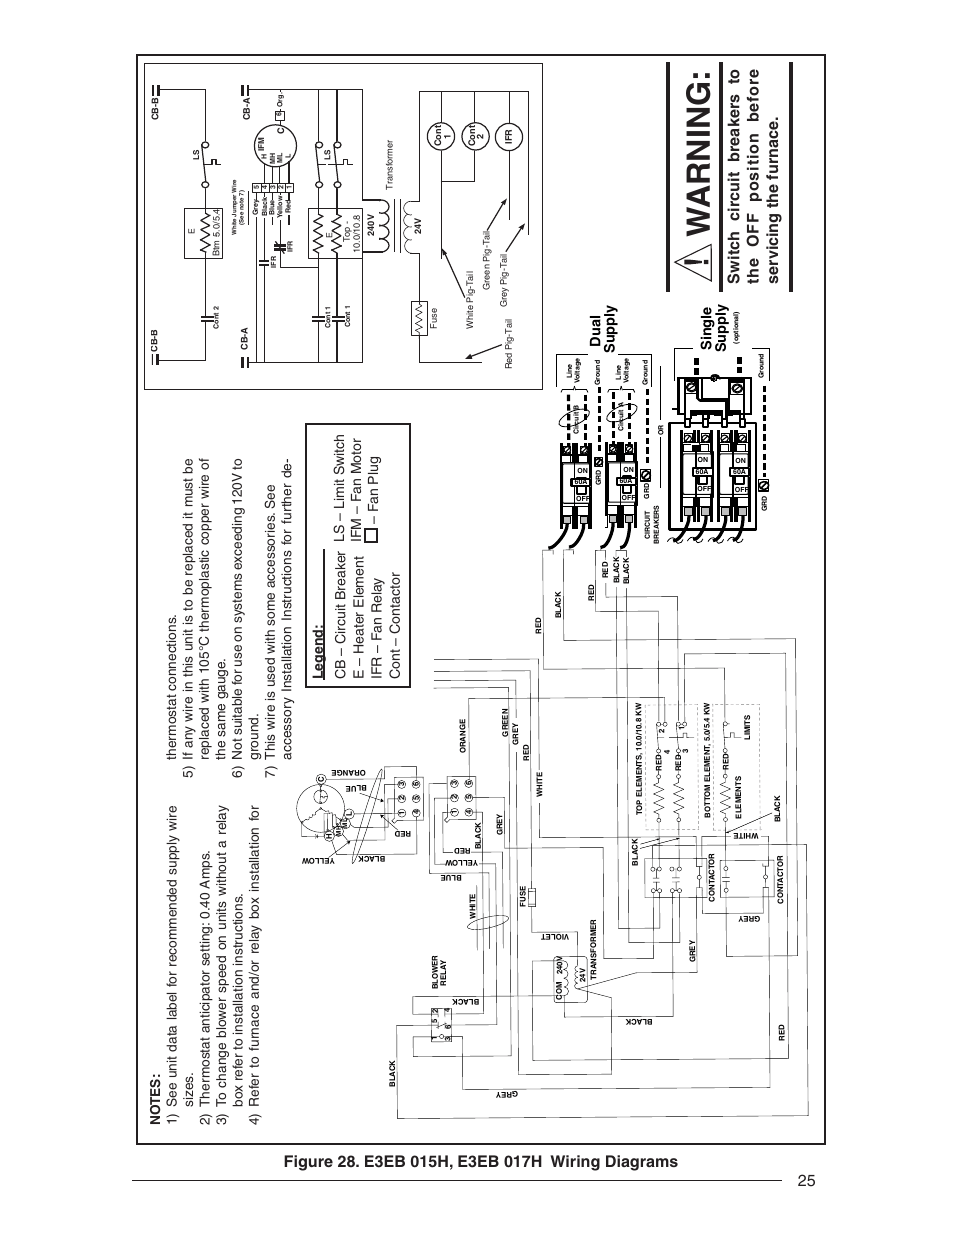 32 E2eb 012ha Wiring Diagram